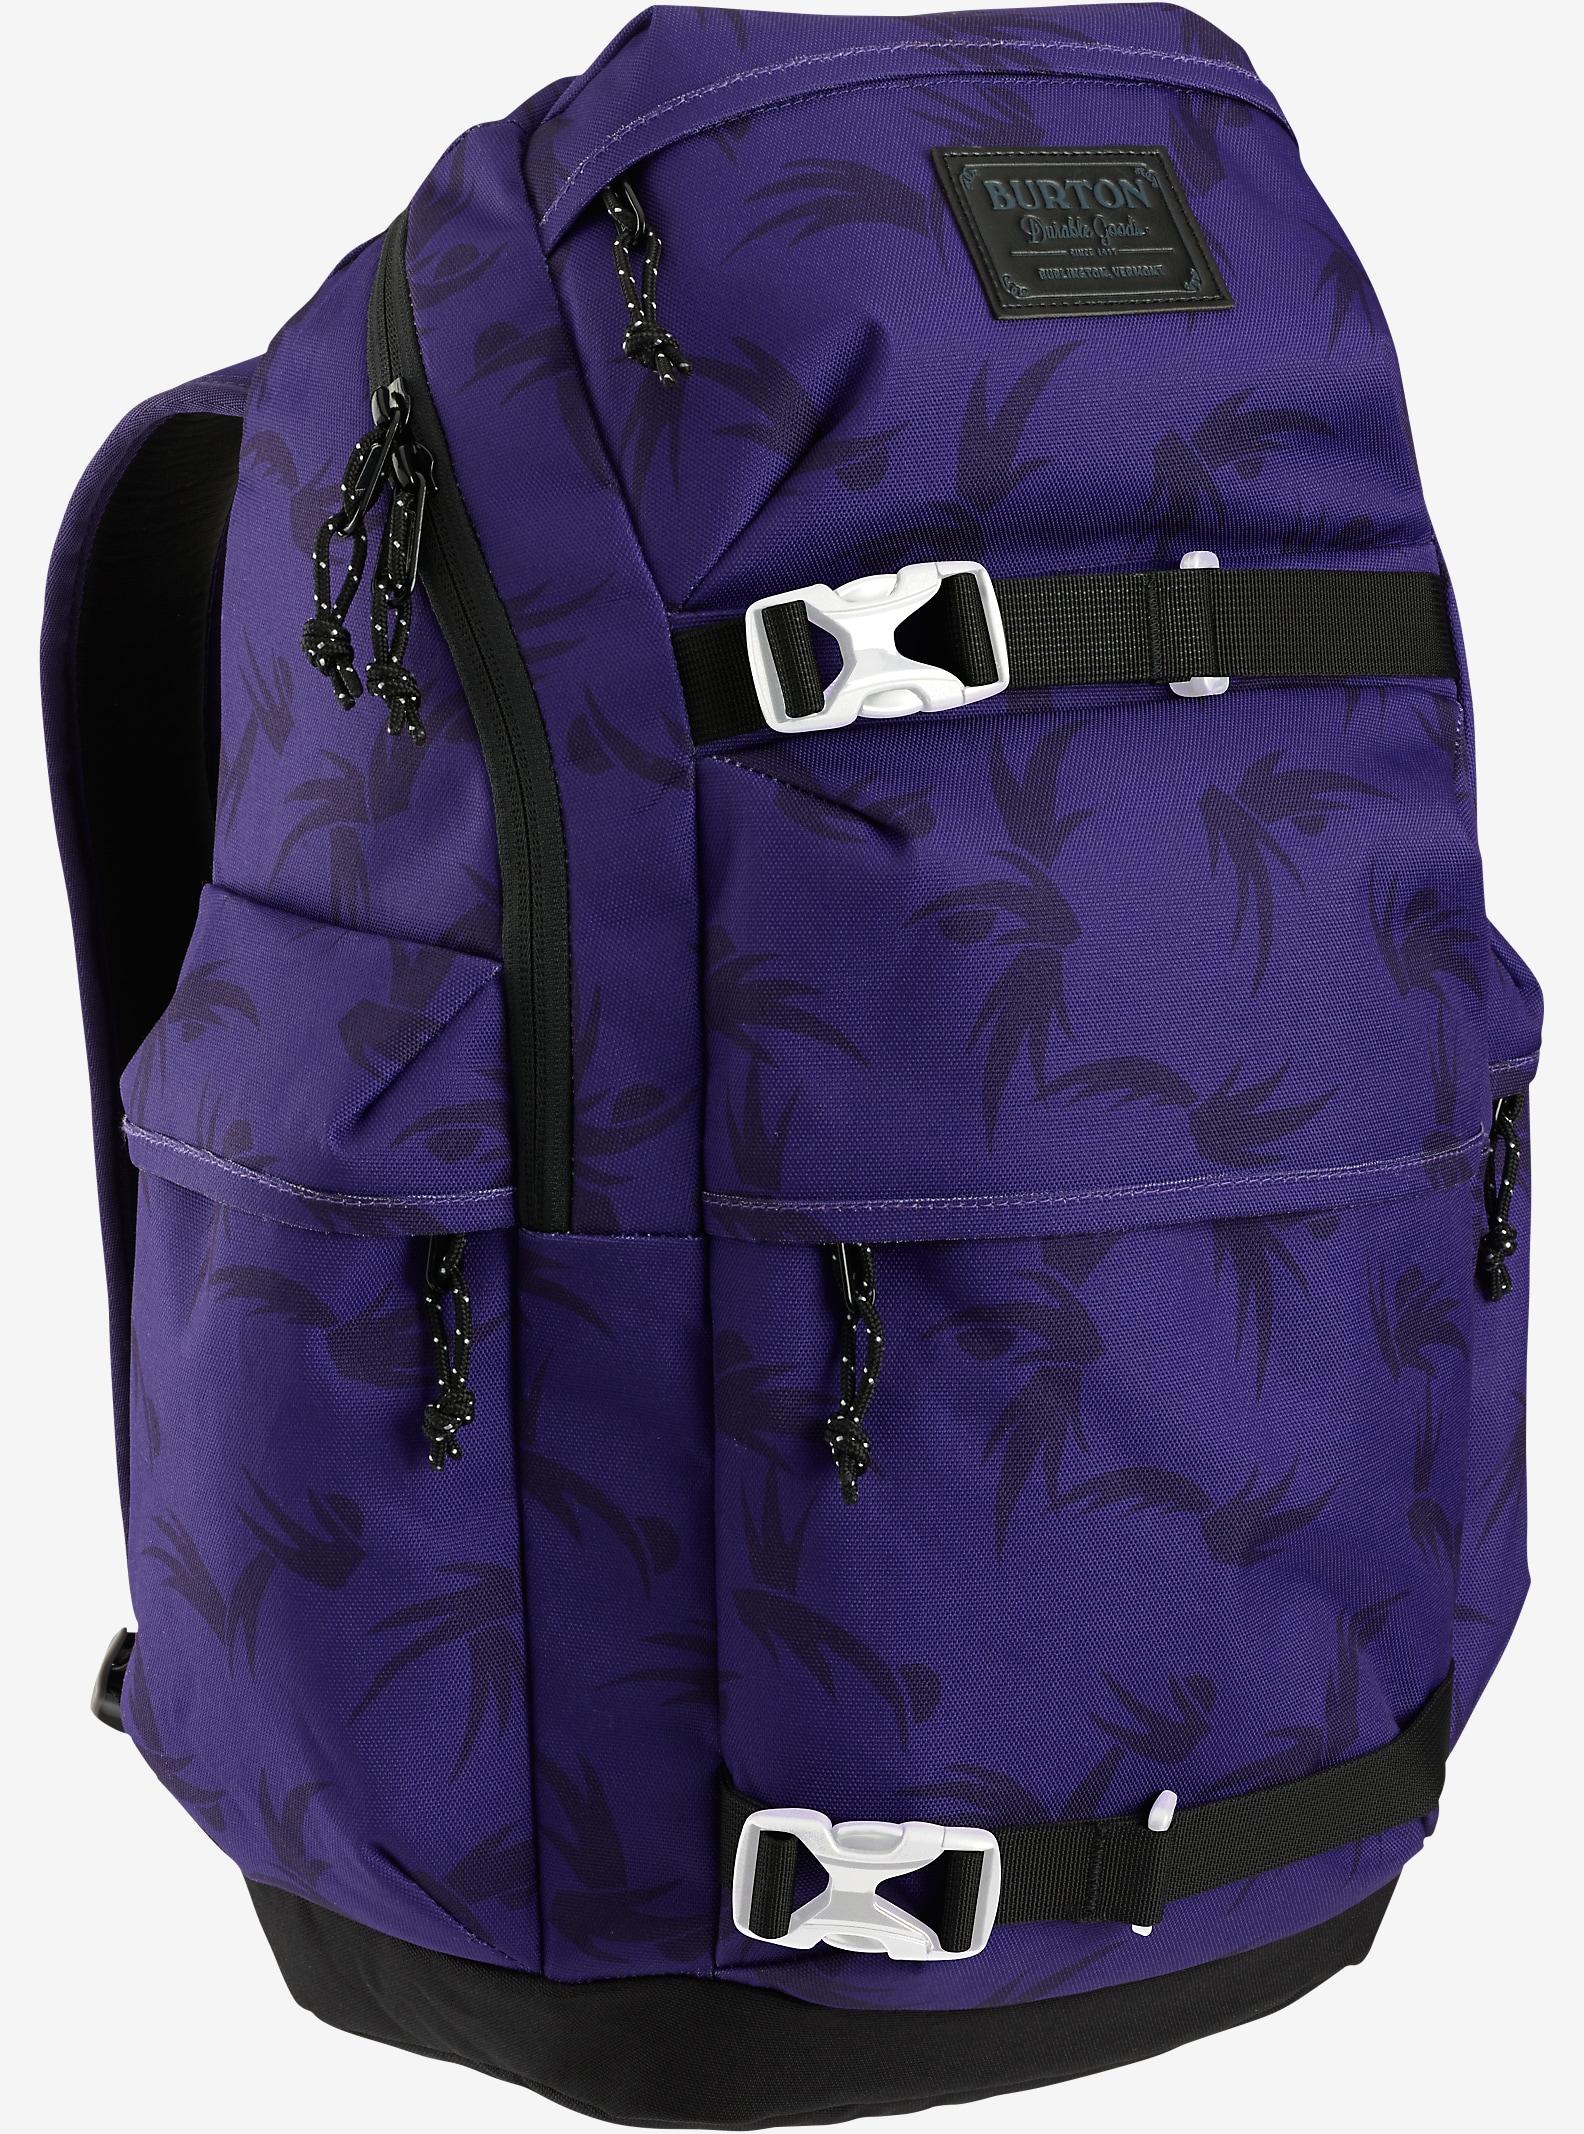 Burton Kilo Backpack shown in Grape Modern Floral